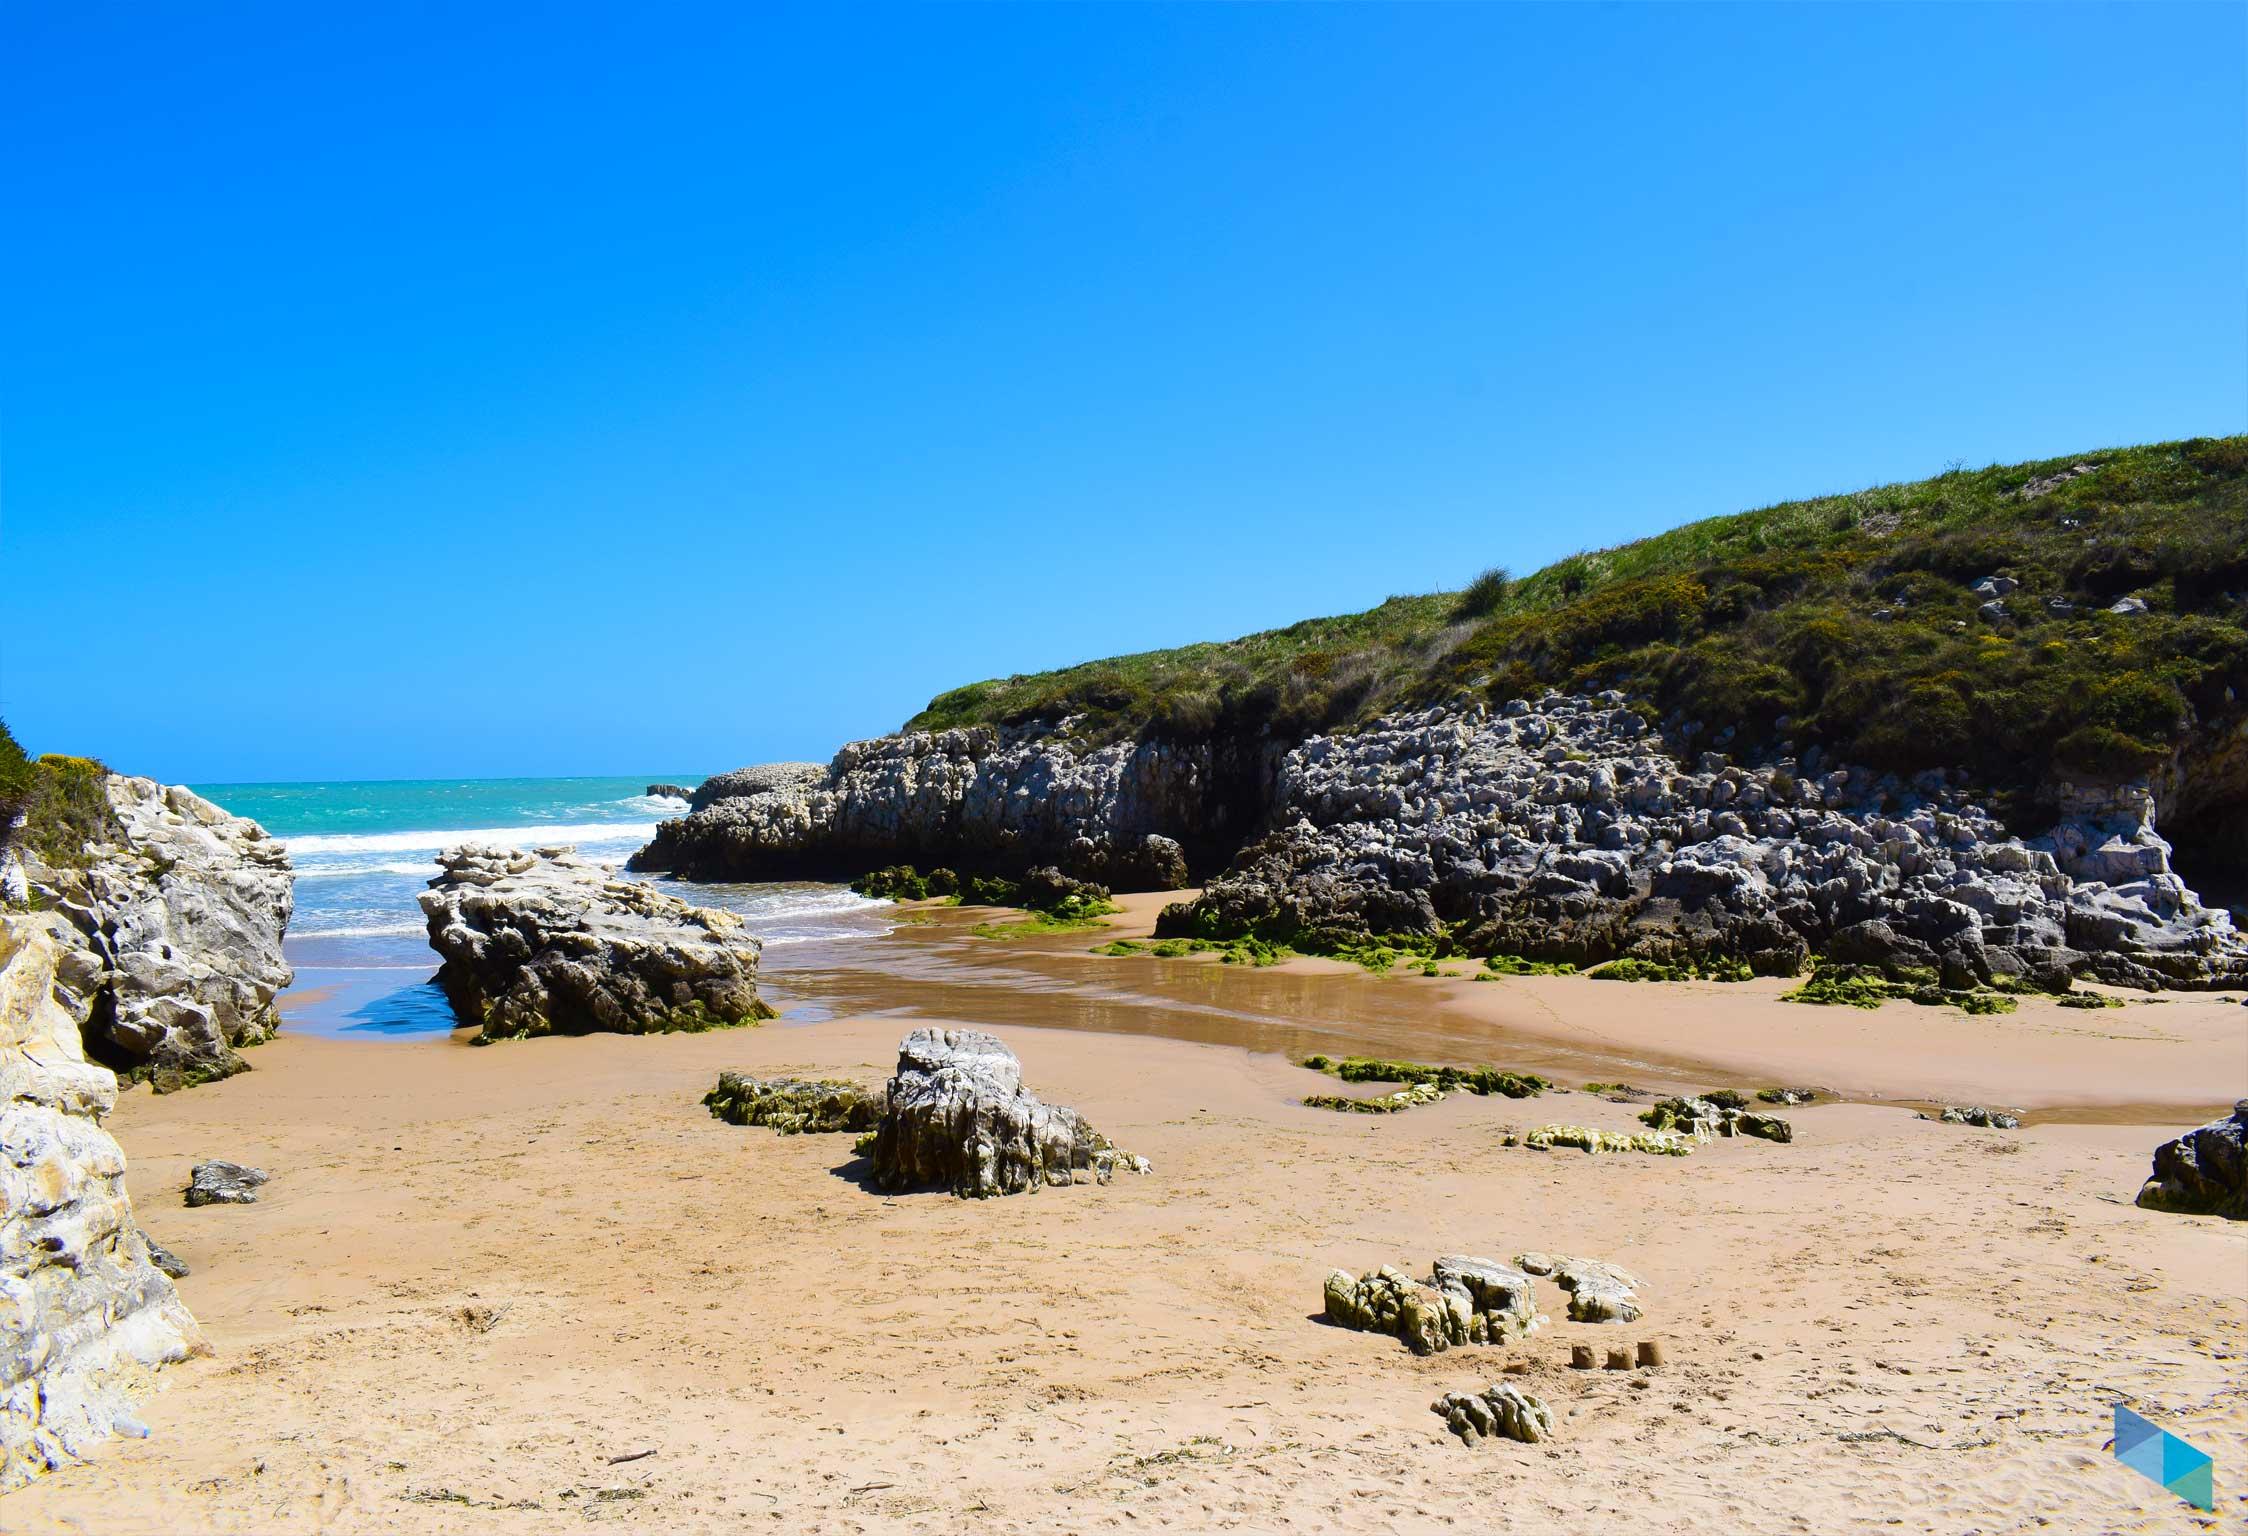 Playa de la Virgen del Mar marea super baja